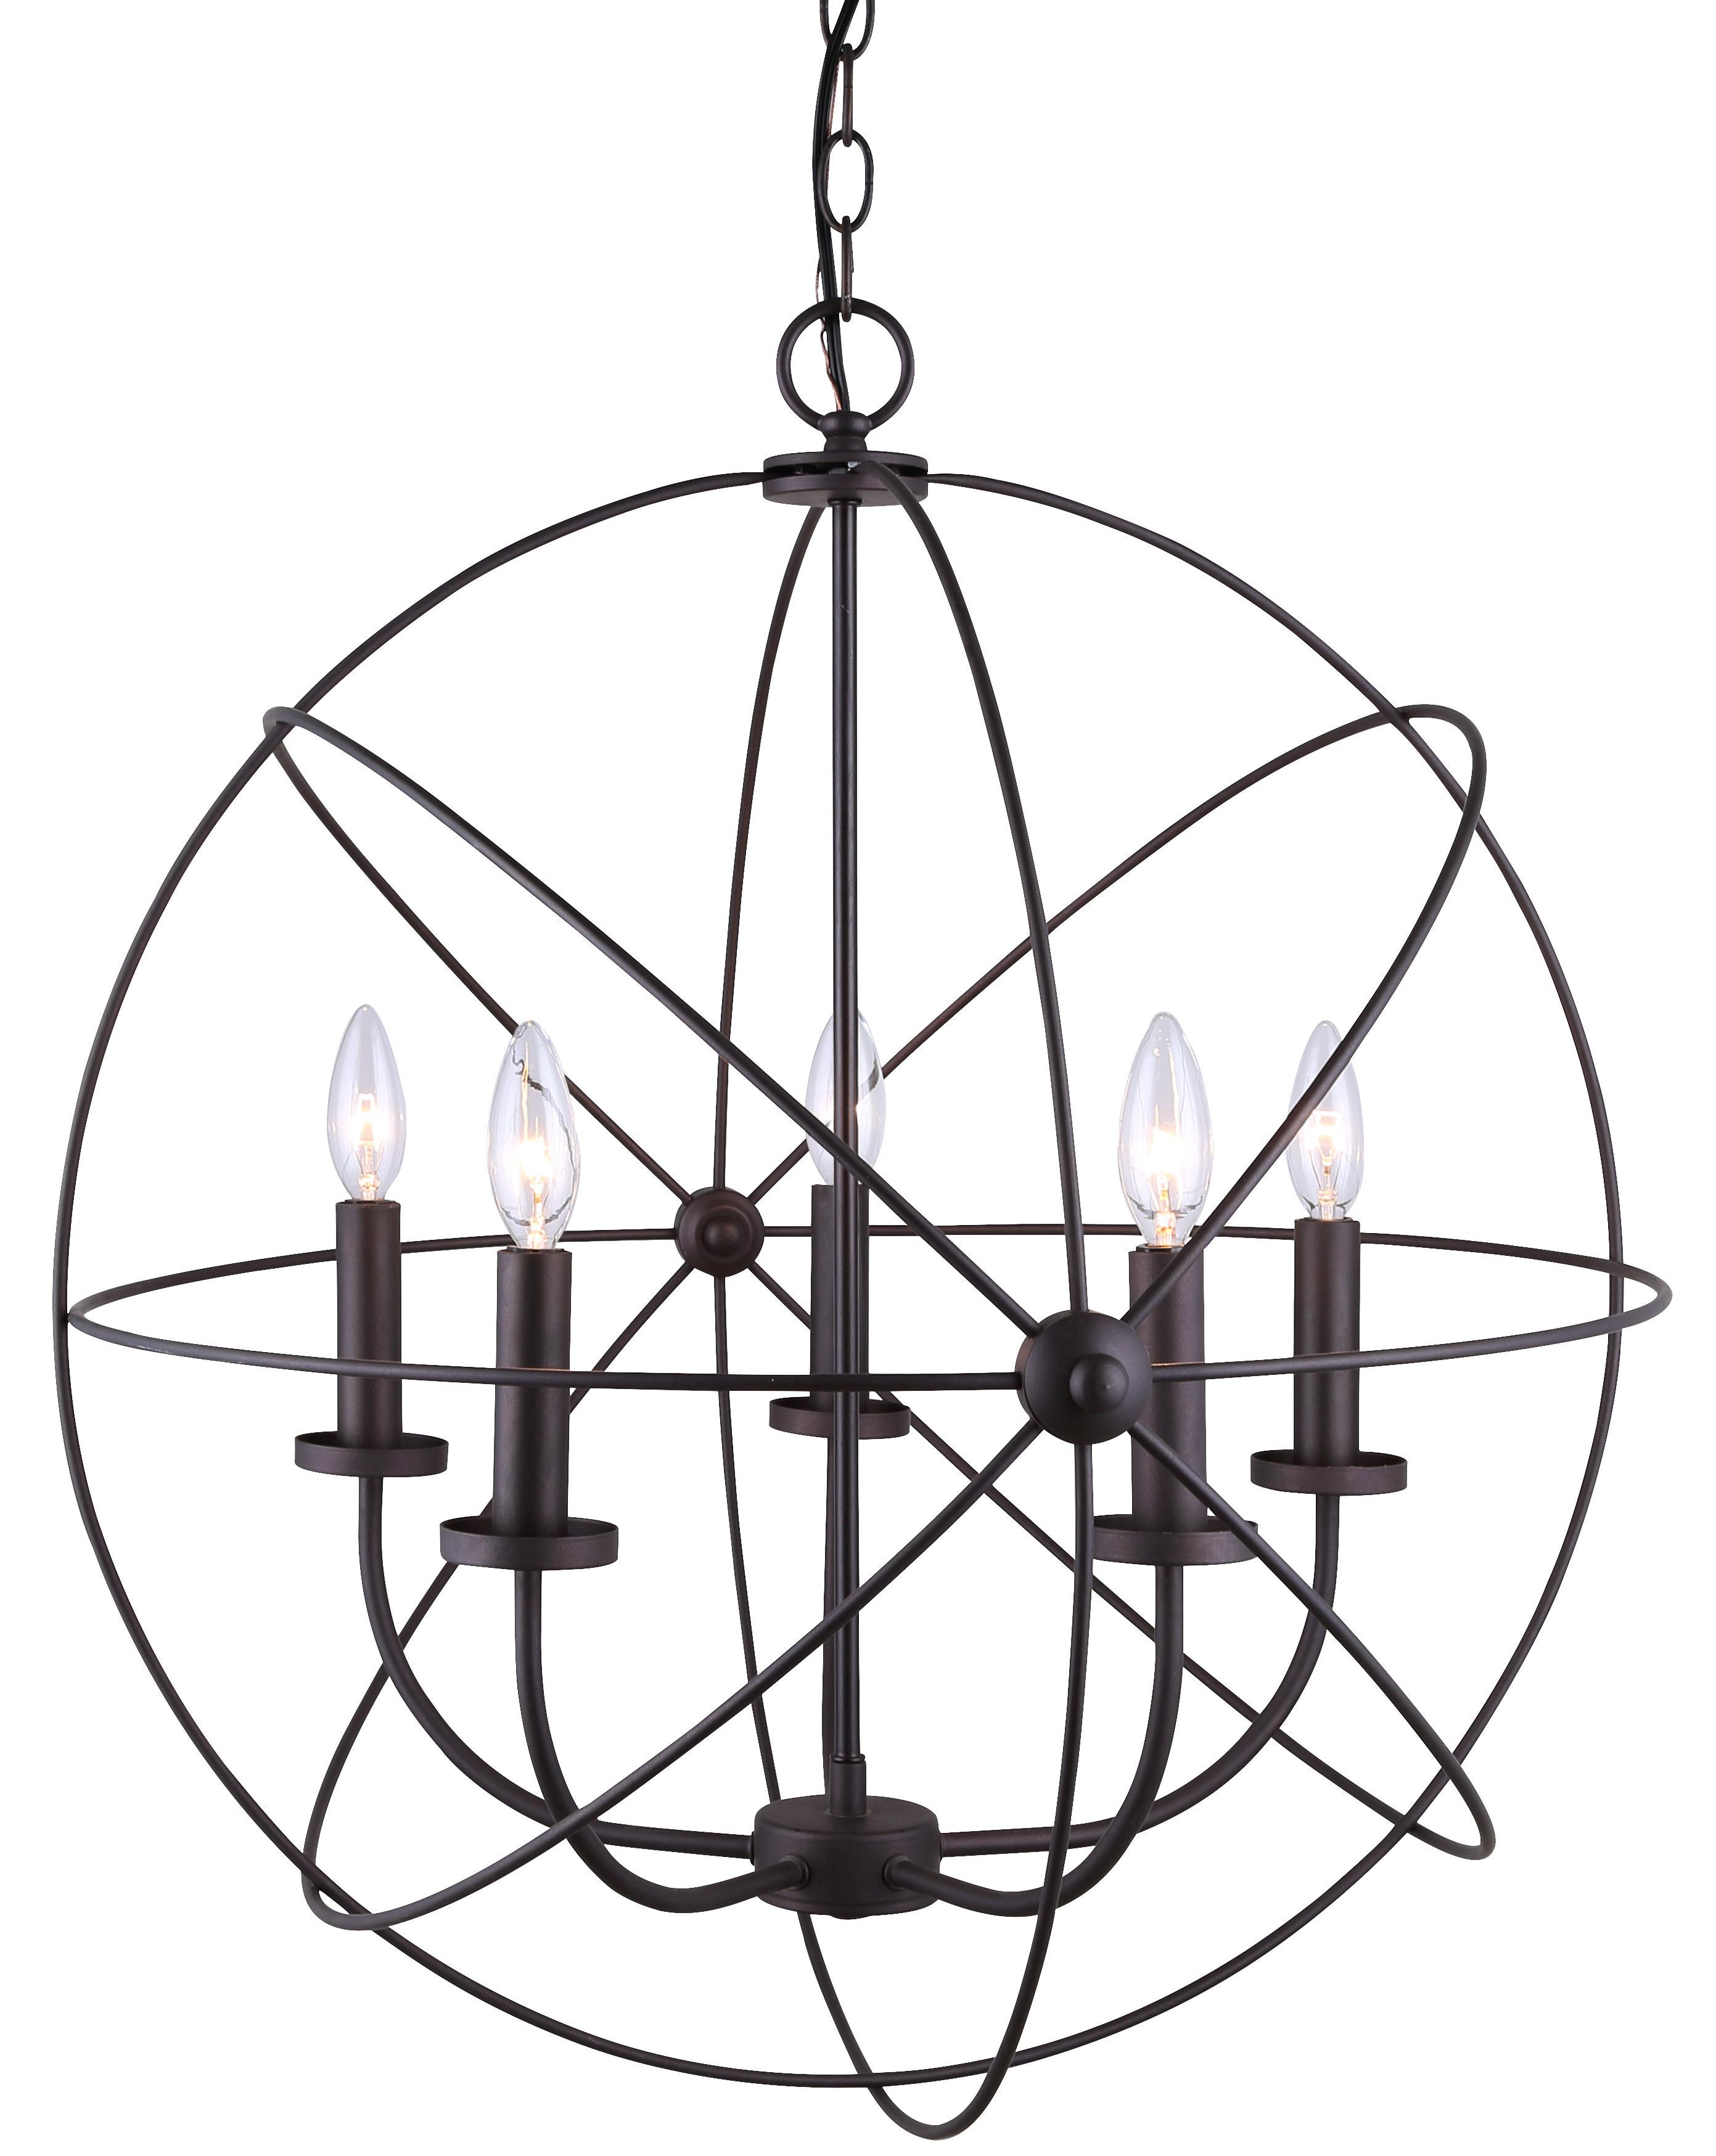 Waldron 5 Light Globe Chandelier Throughout 2020 Waldron 5 Light Globe Chandeliers (View 11 of 20)